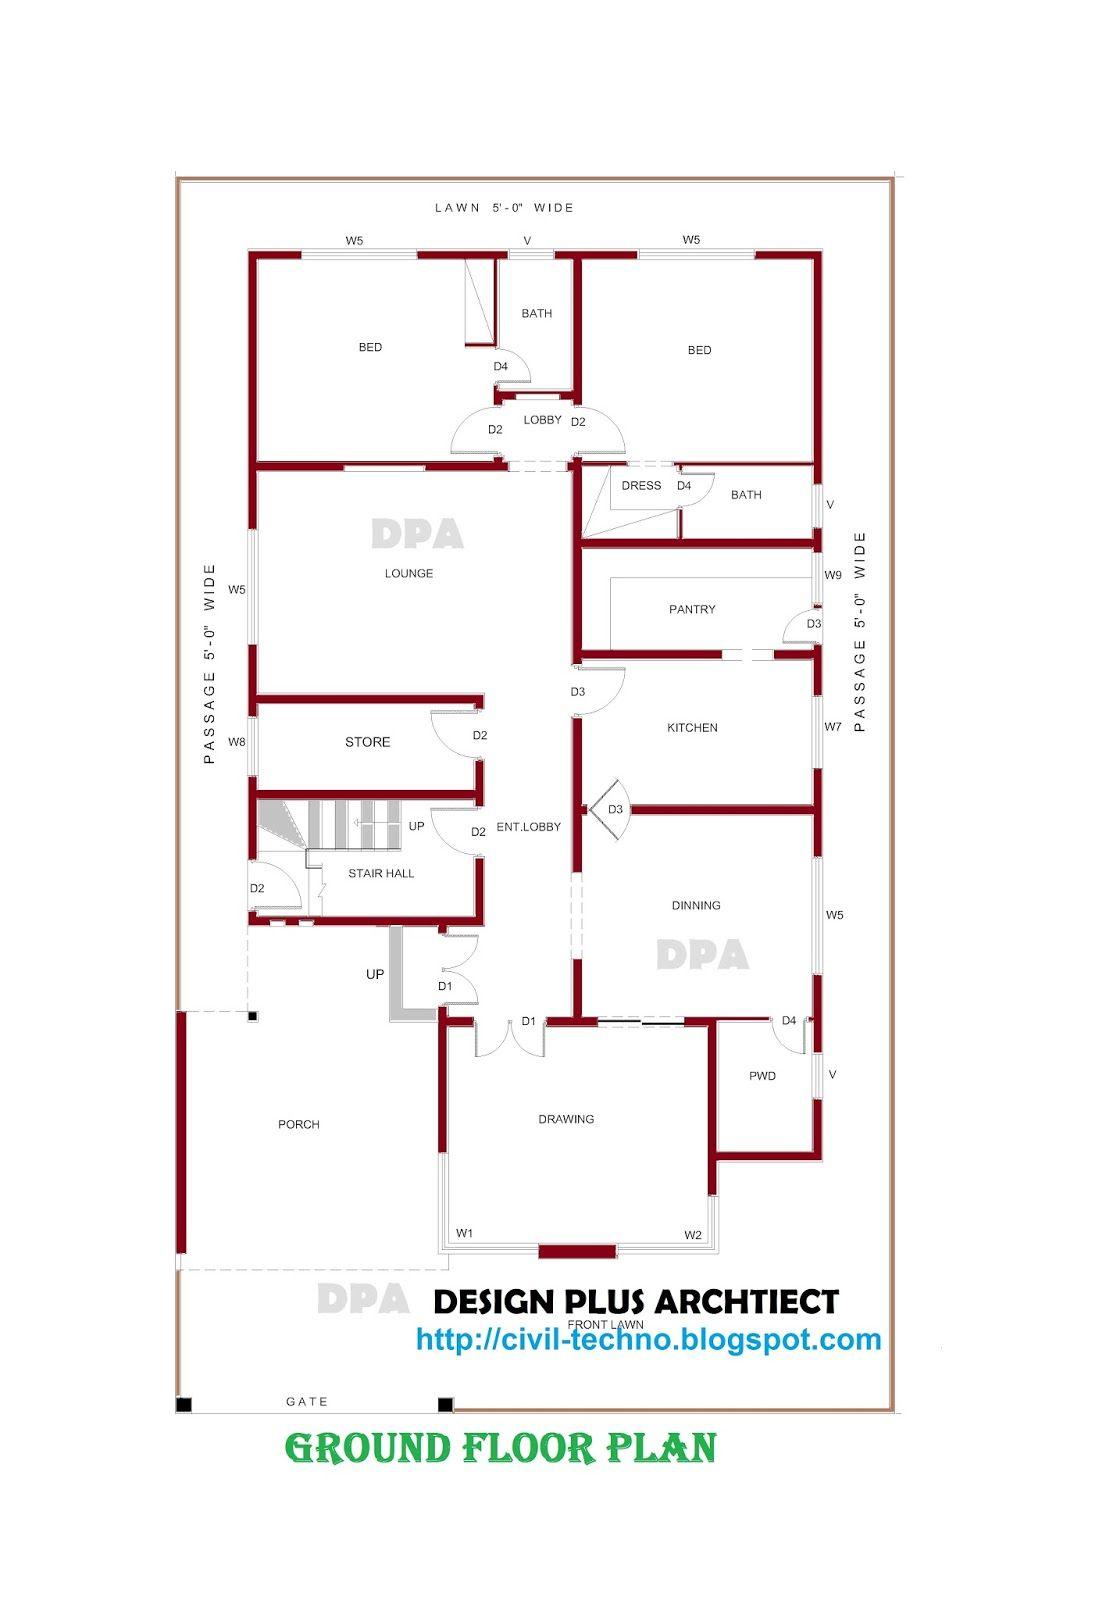 Home Plans Pakistan Decor Architect Designer Mountain Designs Modern Design